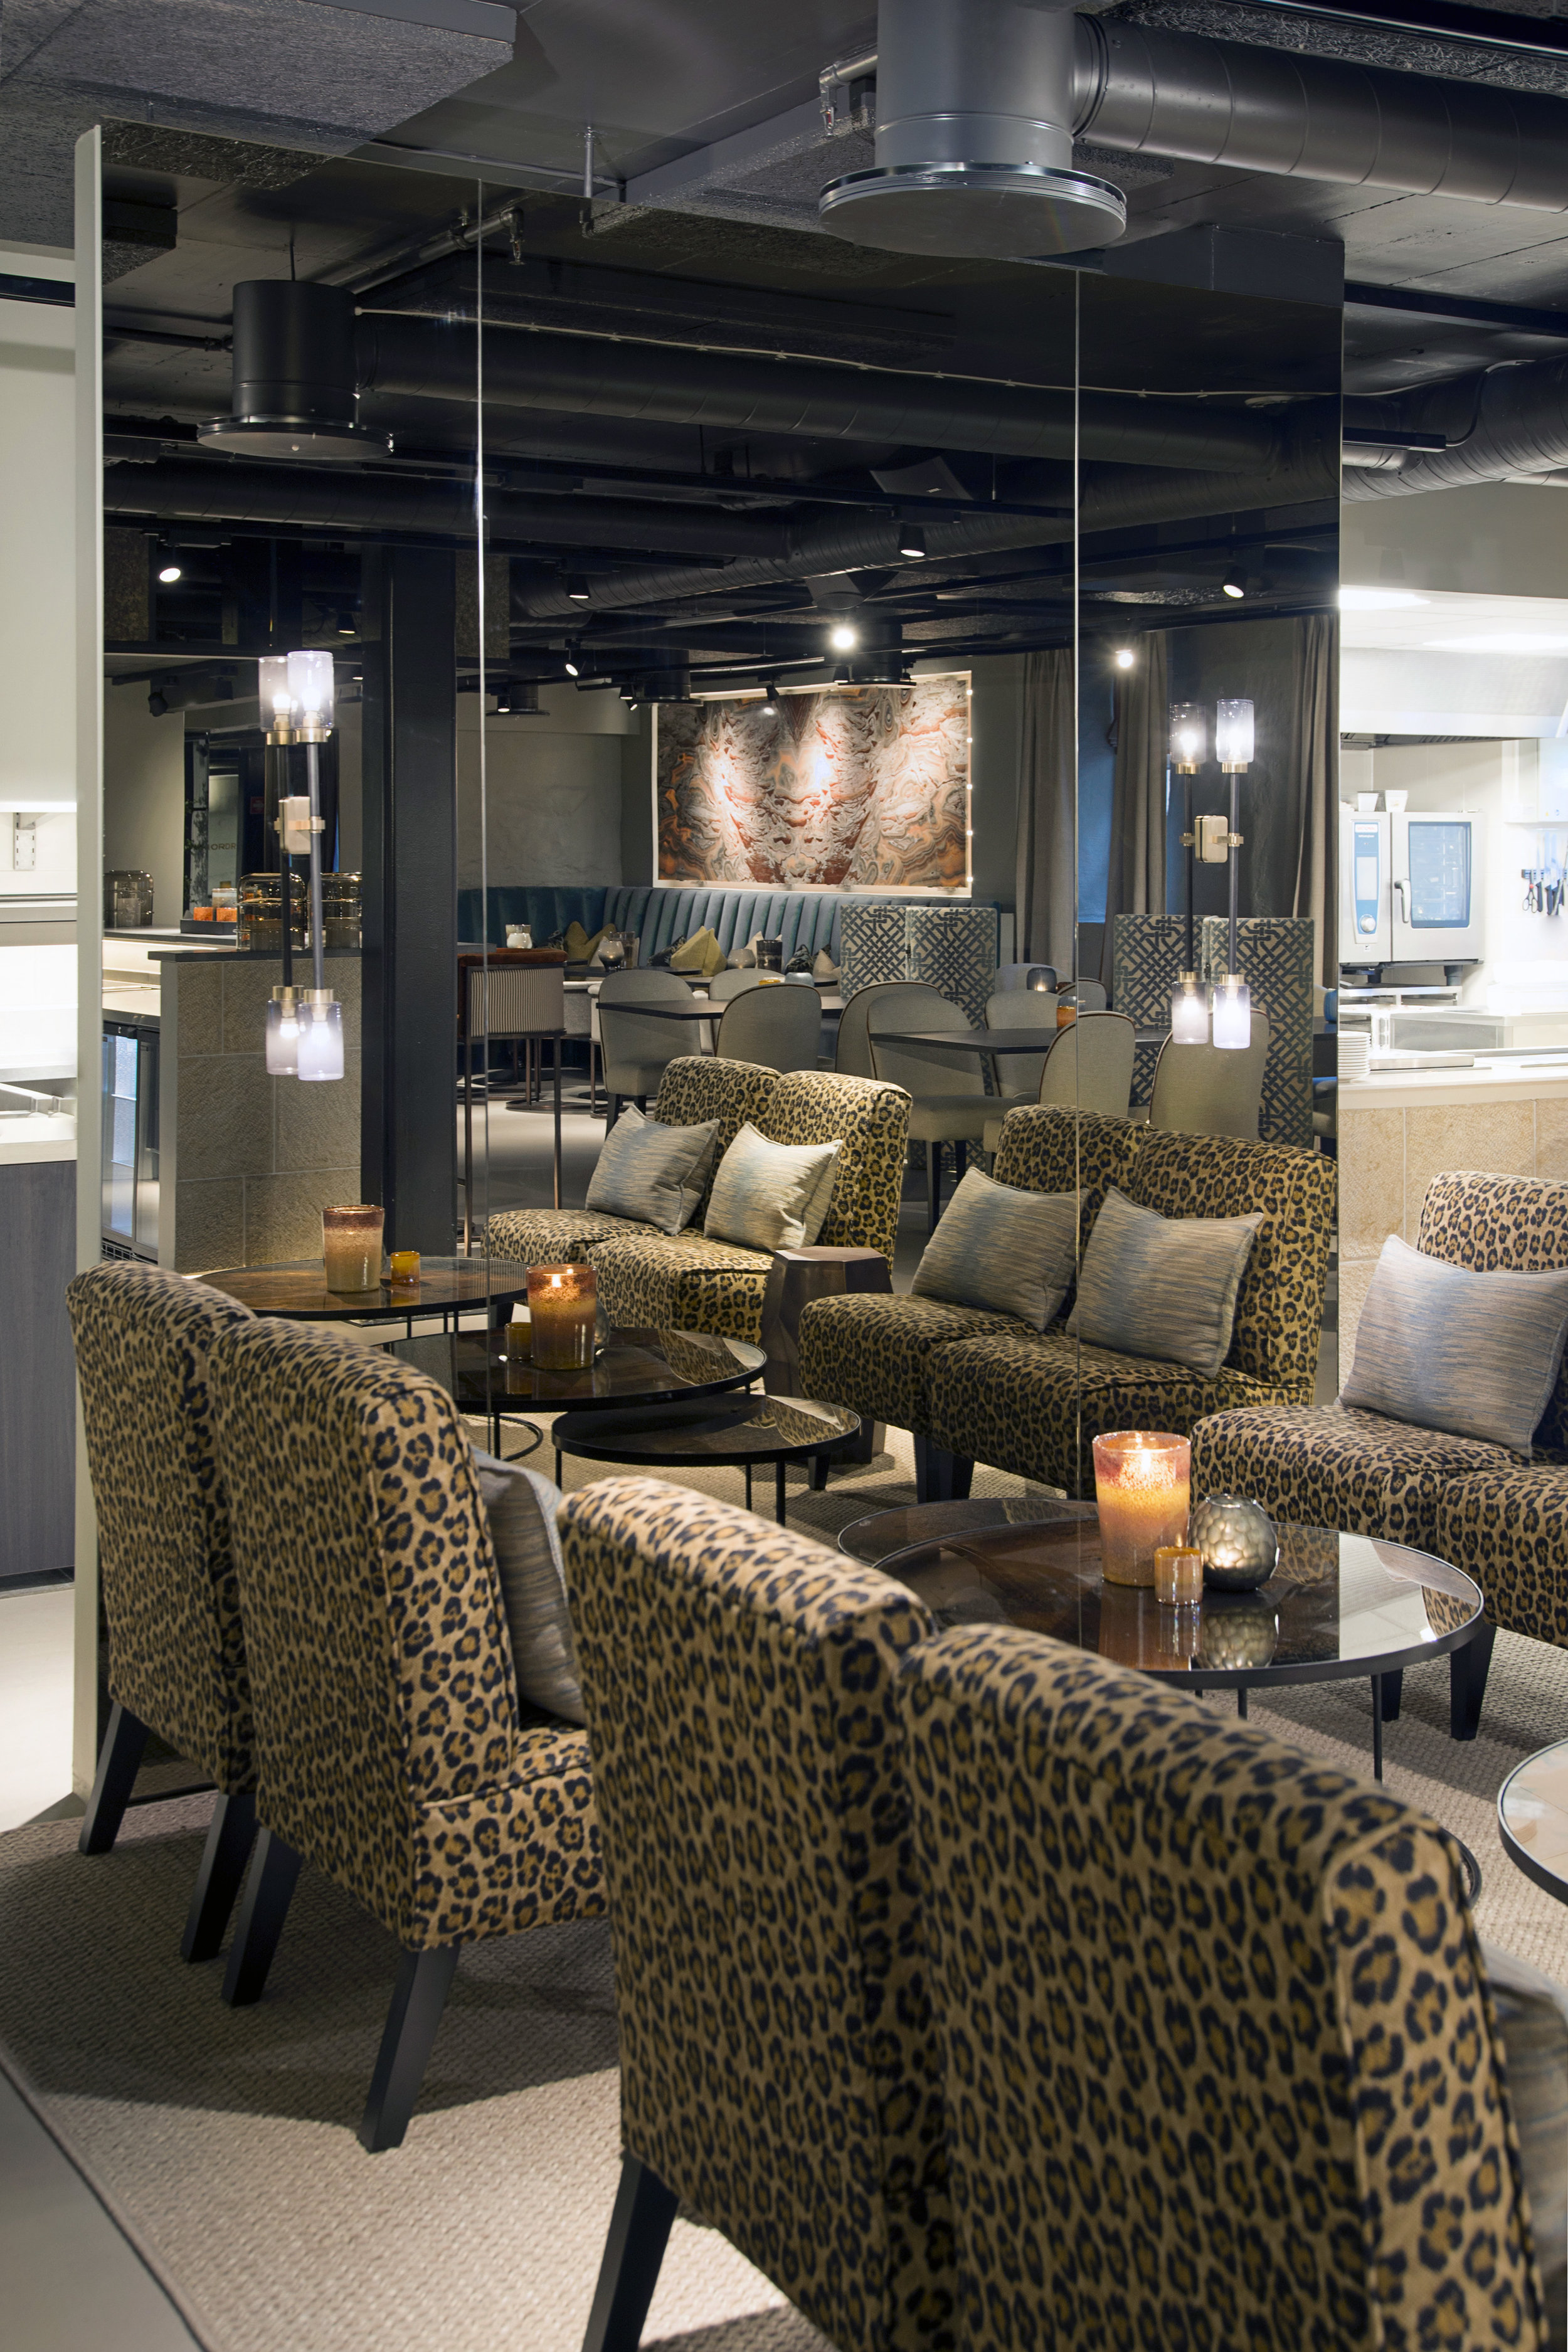 SOG27_Lounge ved speil_01.jpg